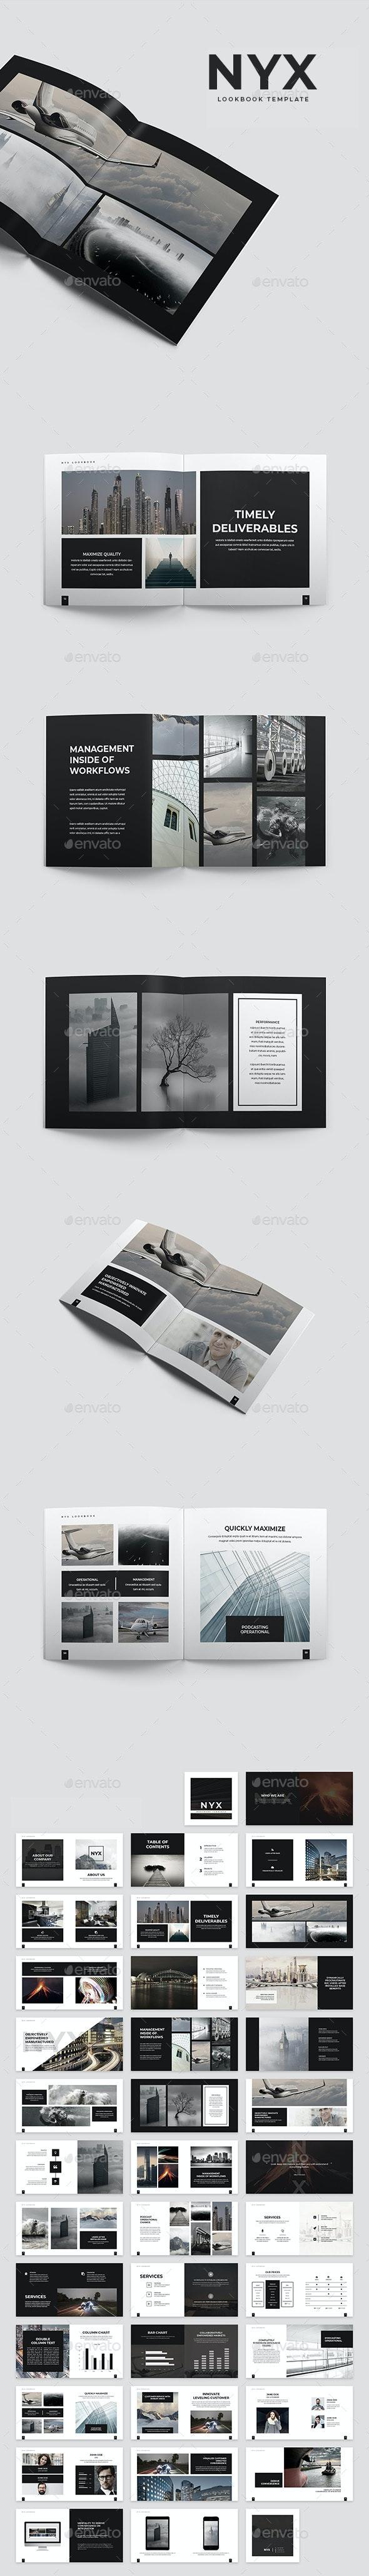 Nyx Lookbook Template - Portfolio Brochures